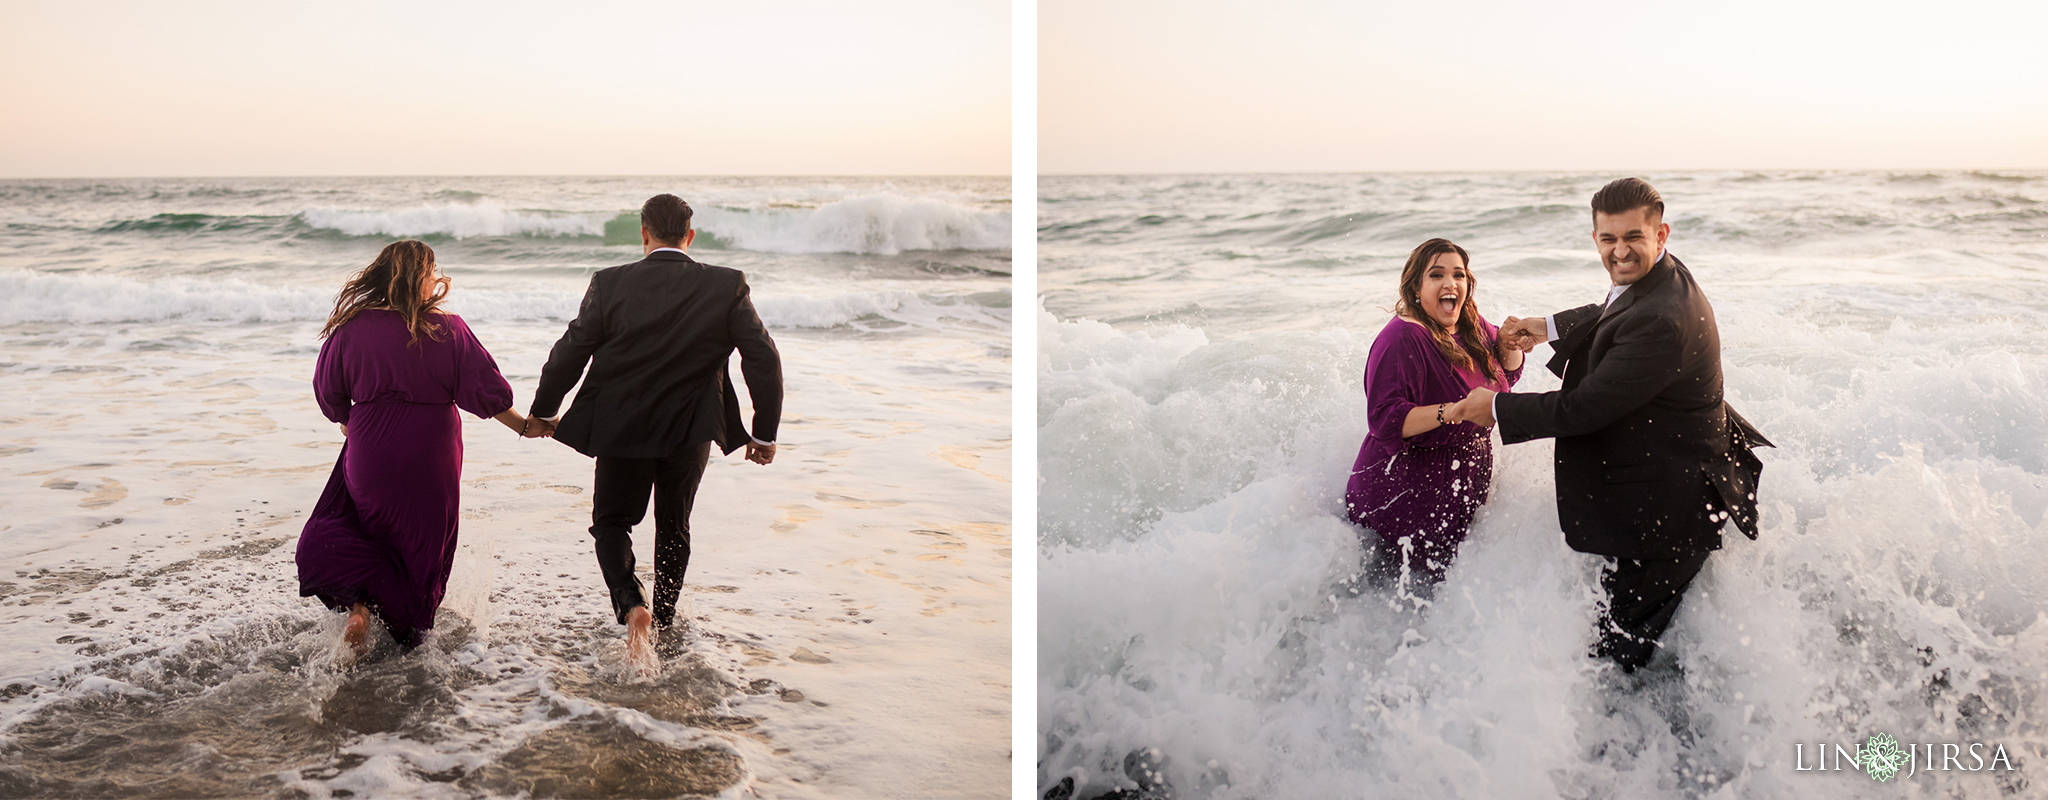 10 Victoria Beach Orange County Engagement Photography 3